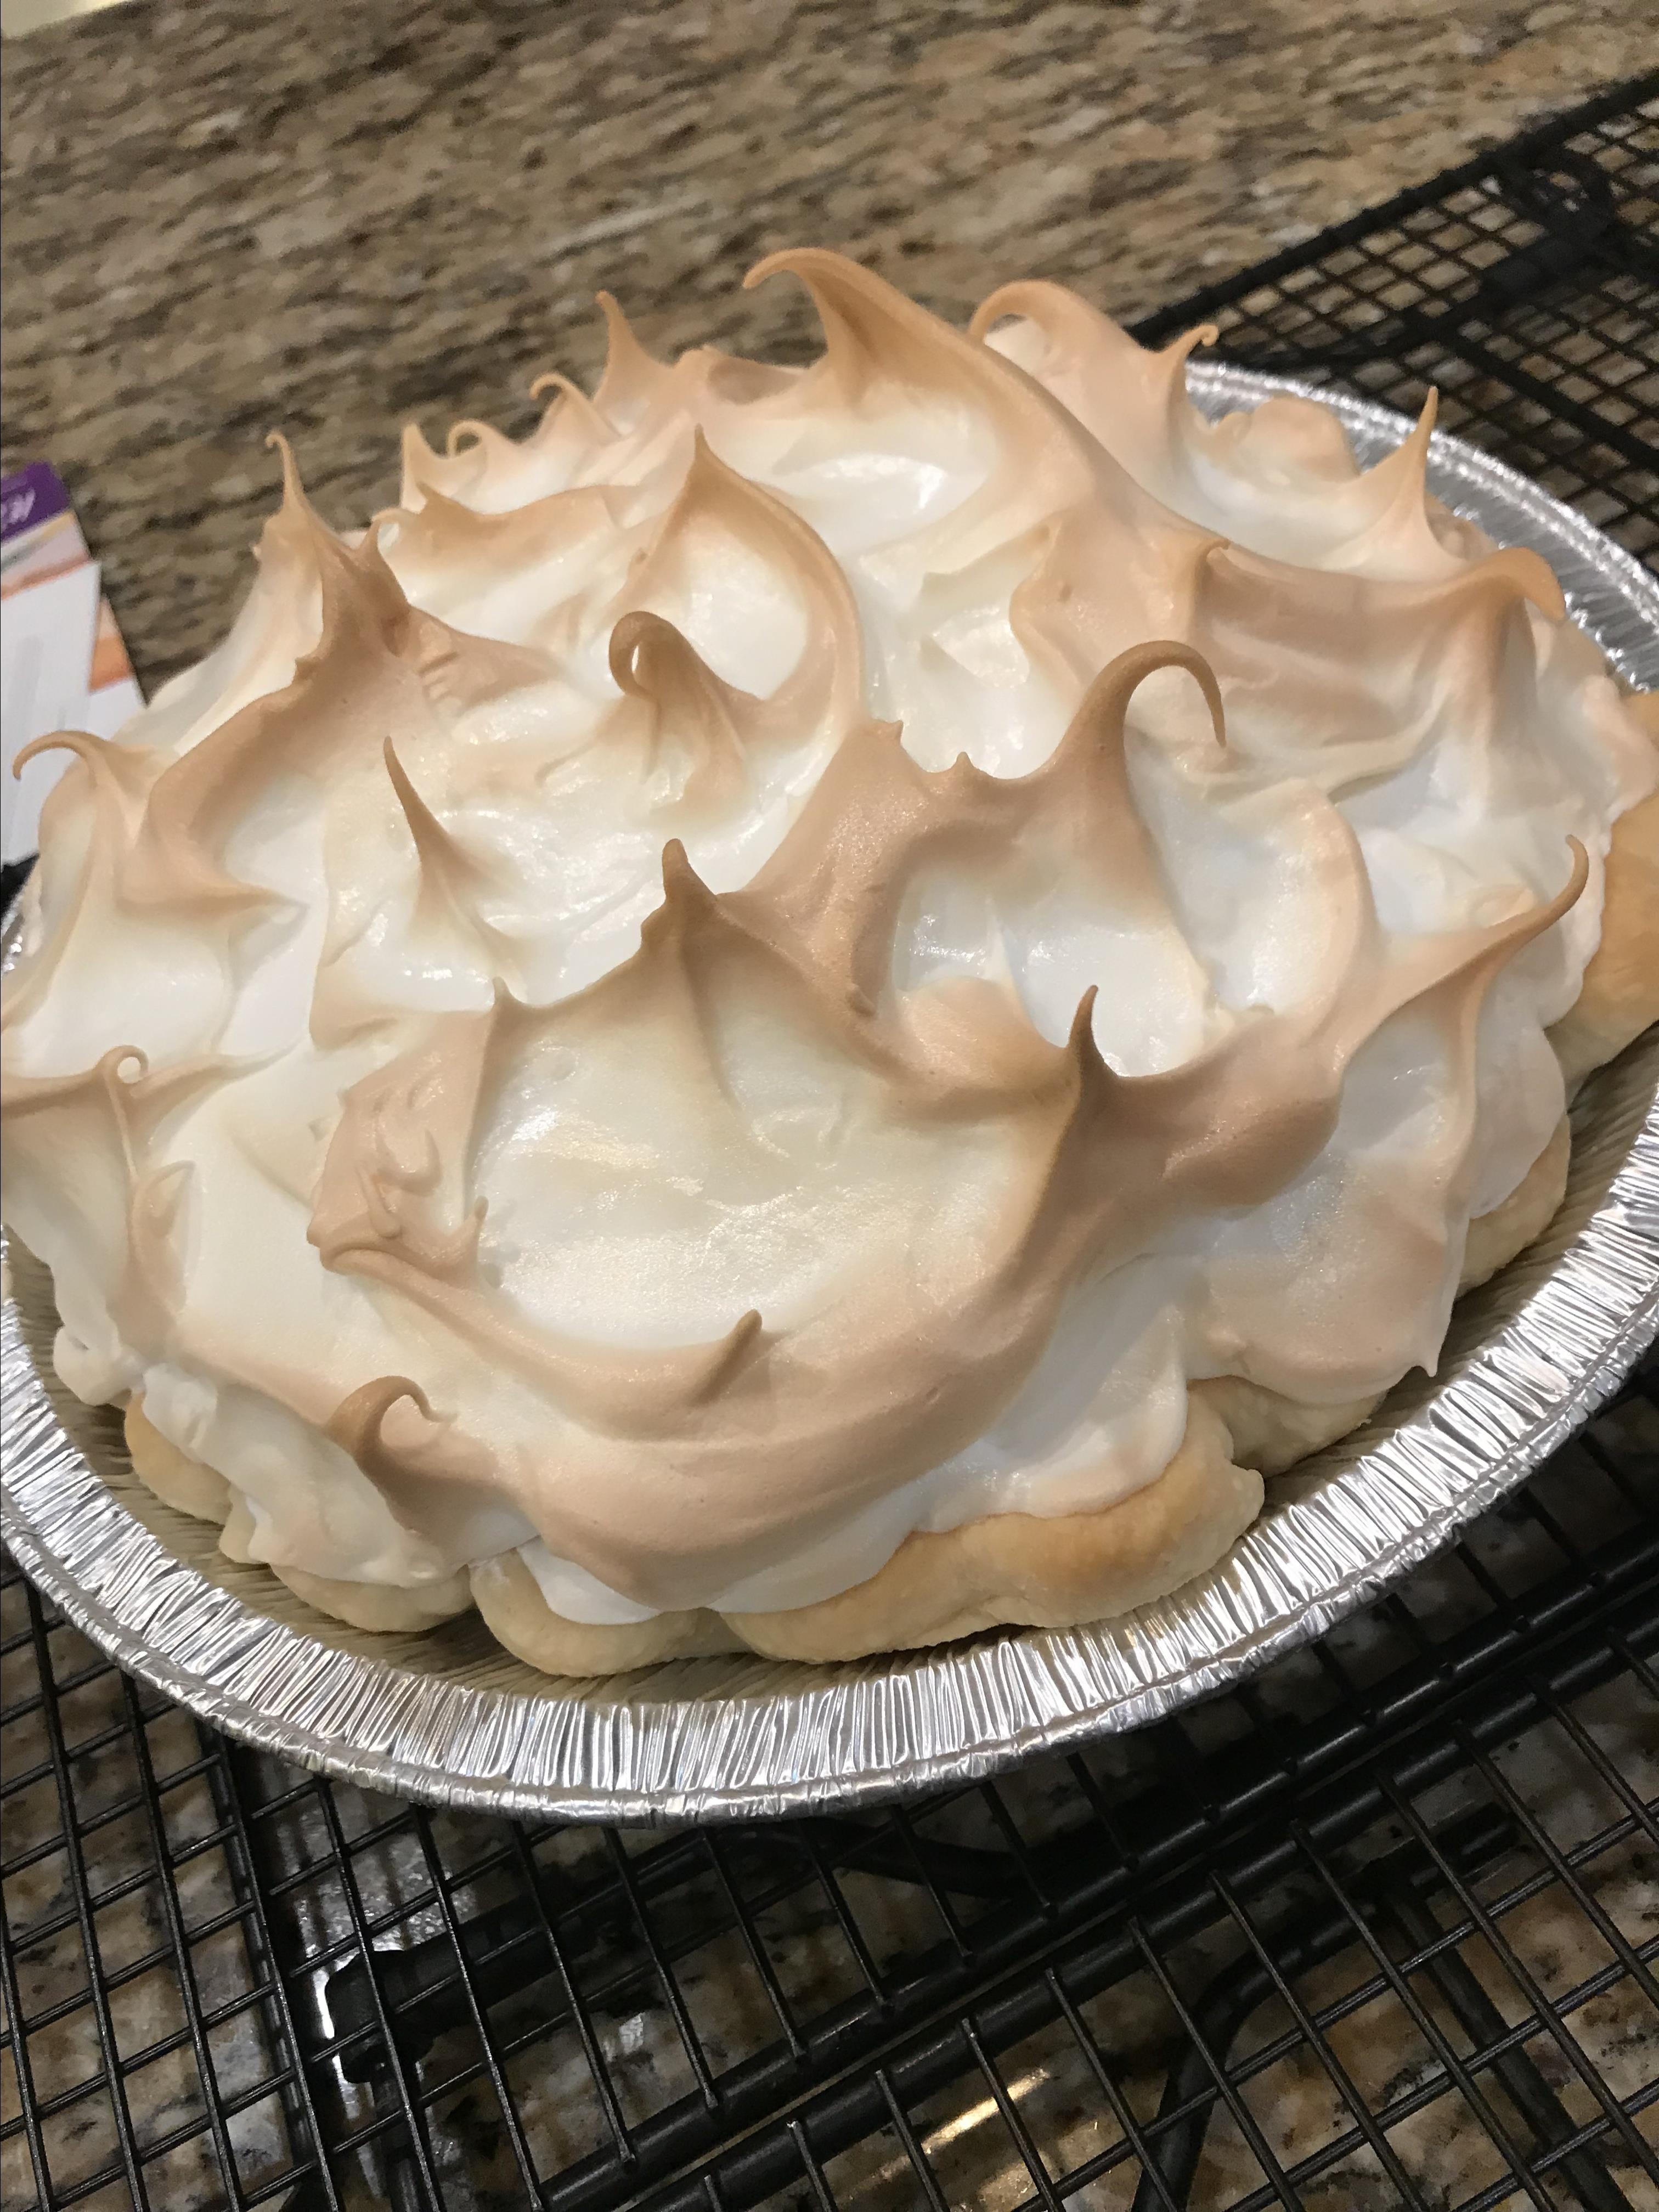 Mom's Chocolate Meringue Pie staceywatts